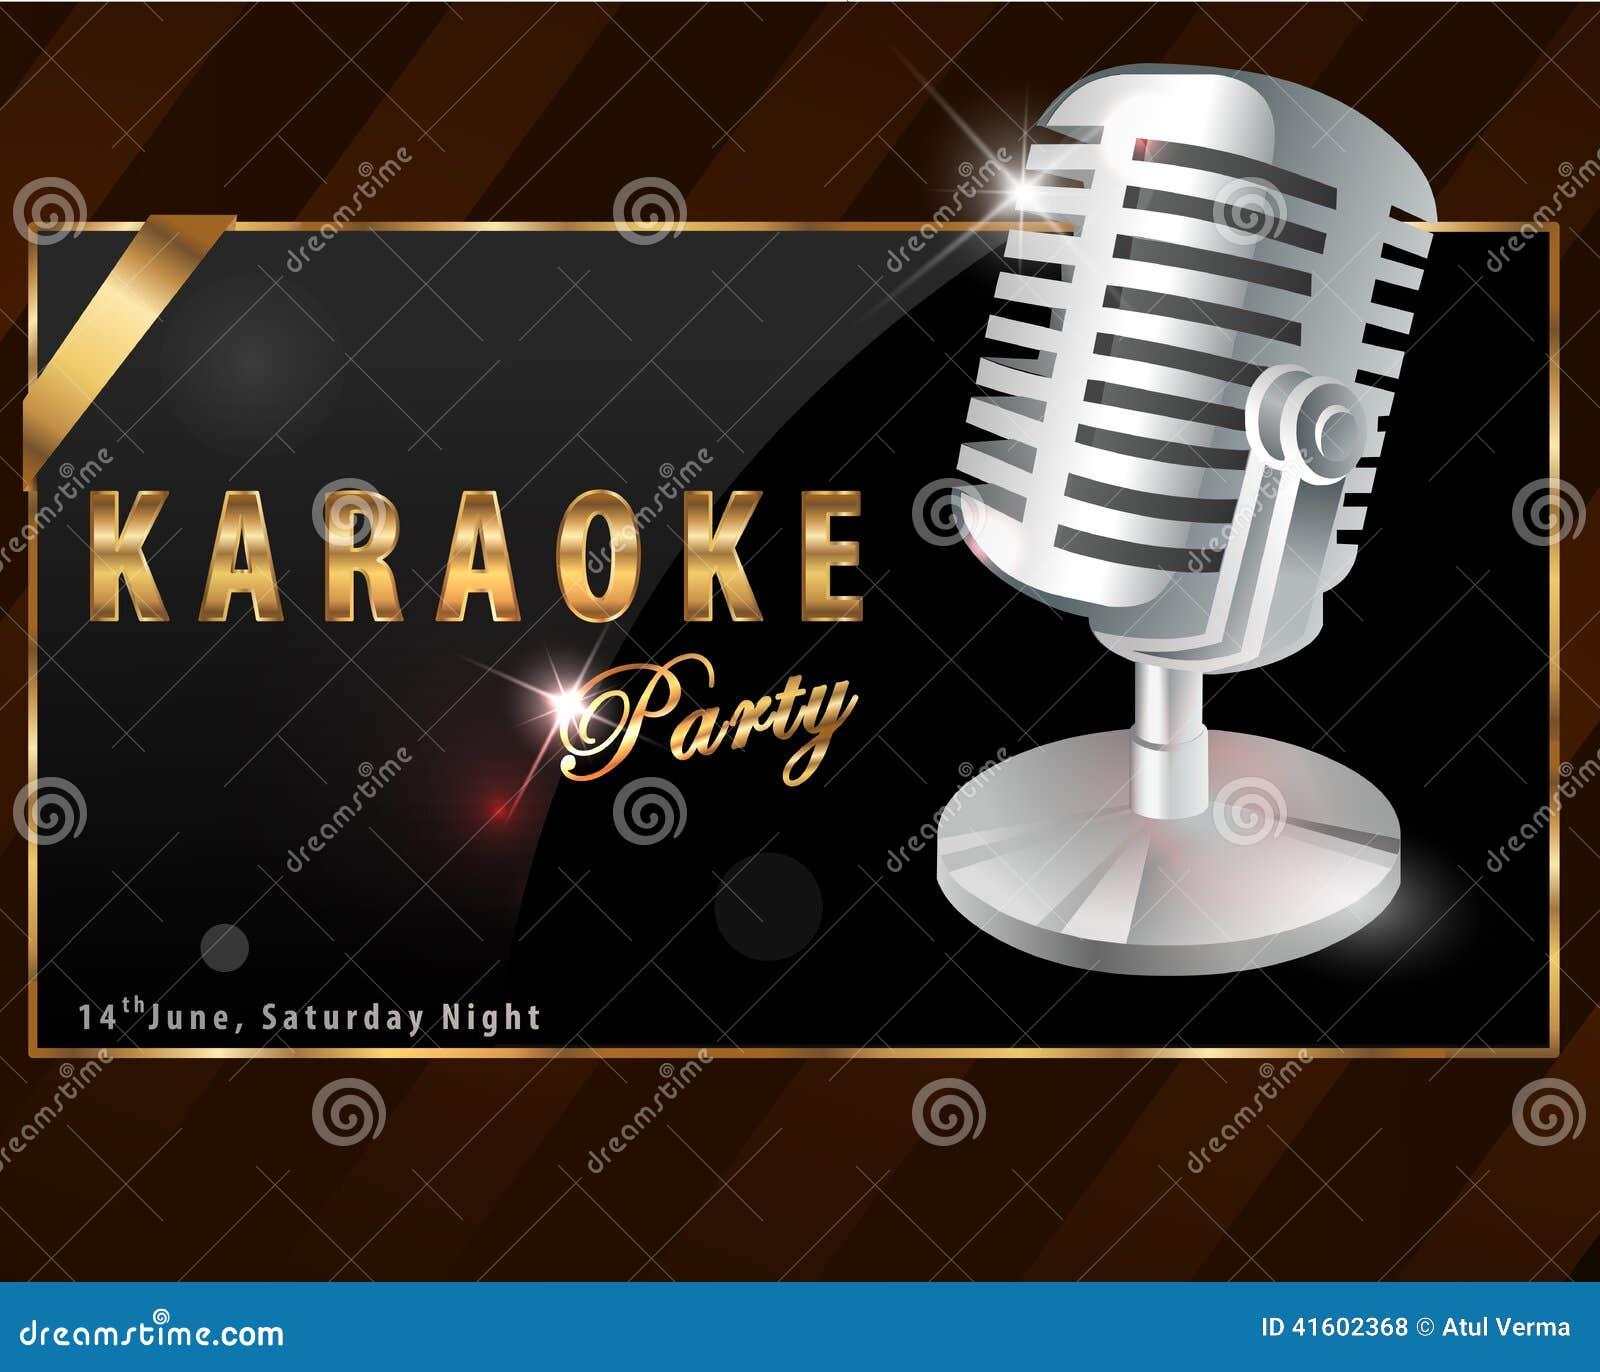 karaokeparty free